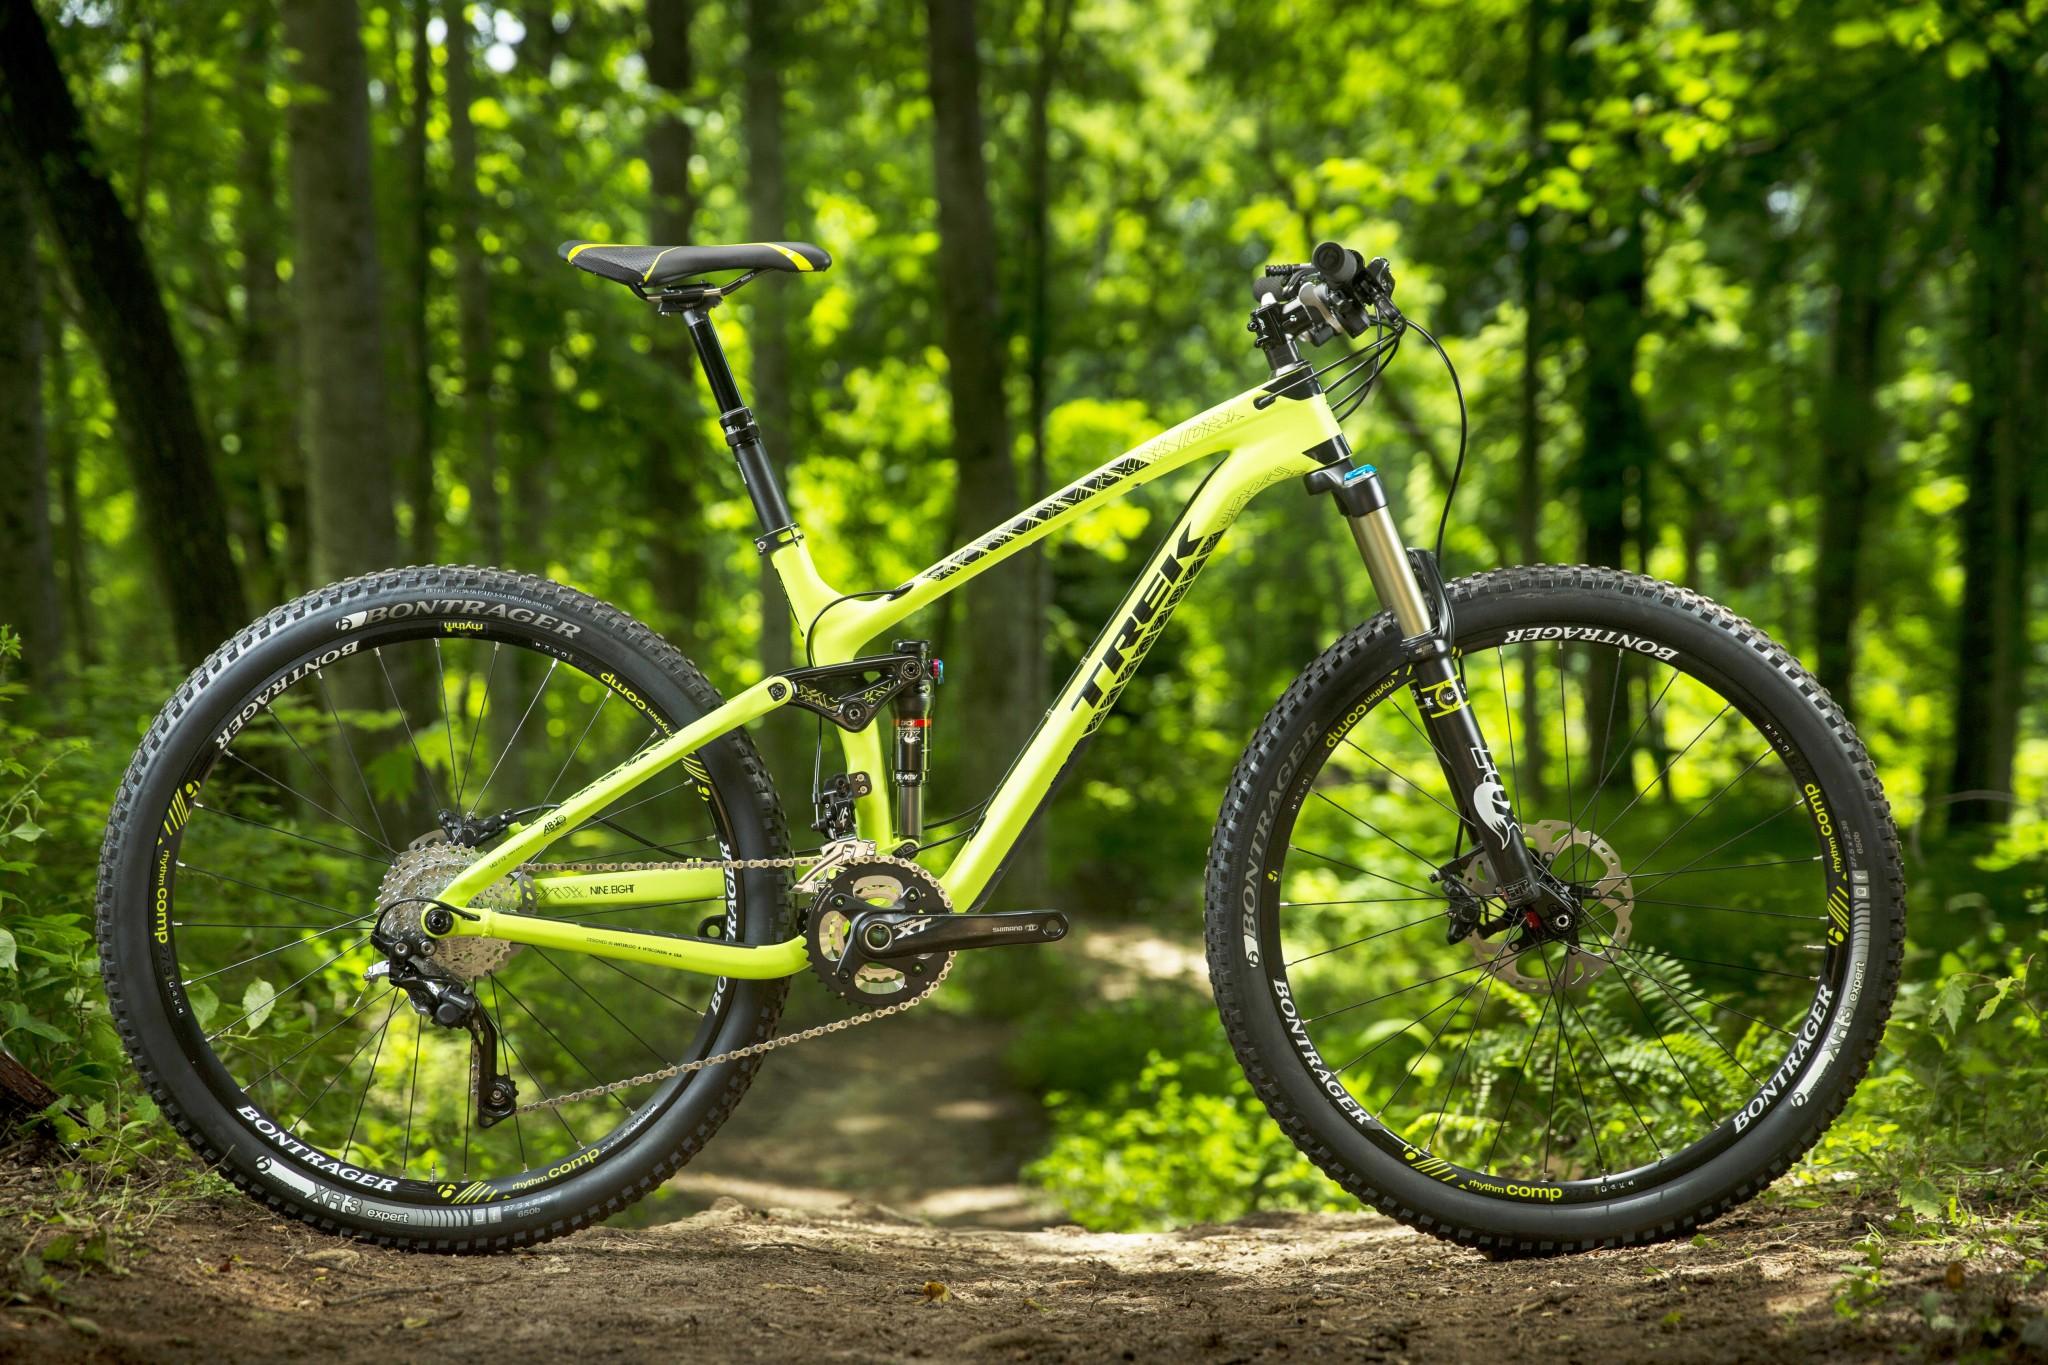 Trek Fuel Ex 8 Wallpaper: Reviews » Bikes » Trail